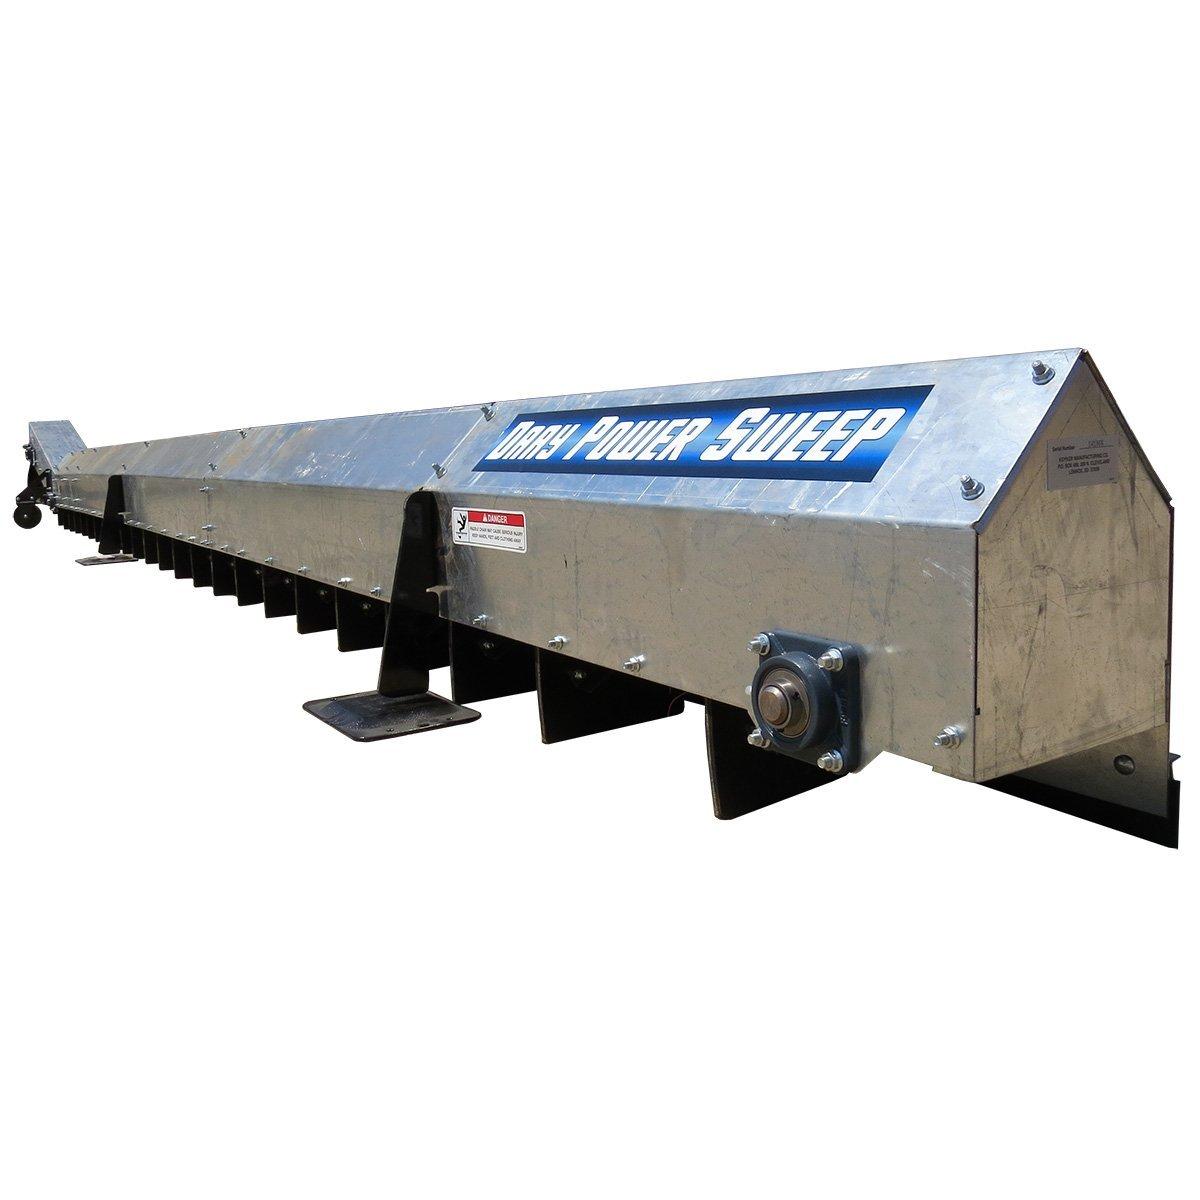 Fast-Bin-Unload-Perfect-for-Safe-Bin-Environment